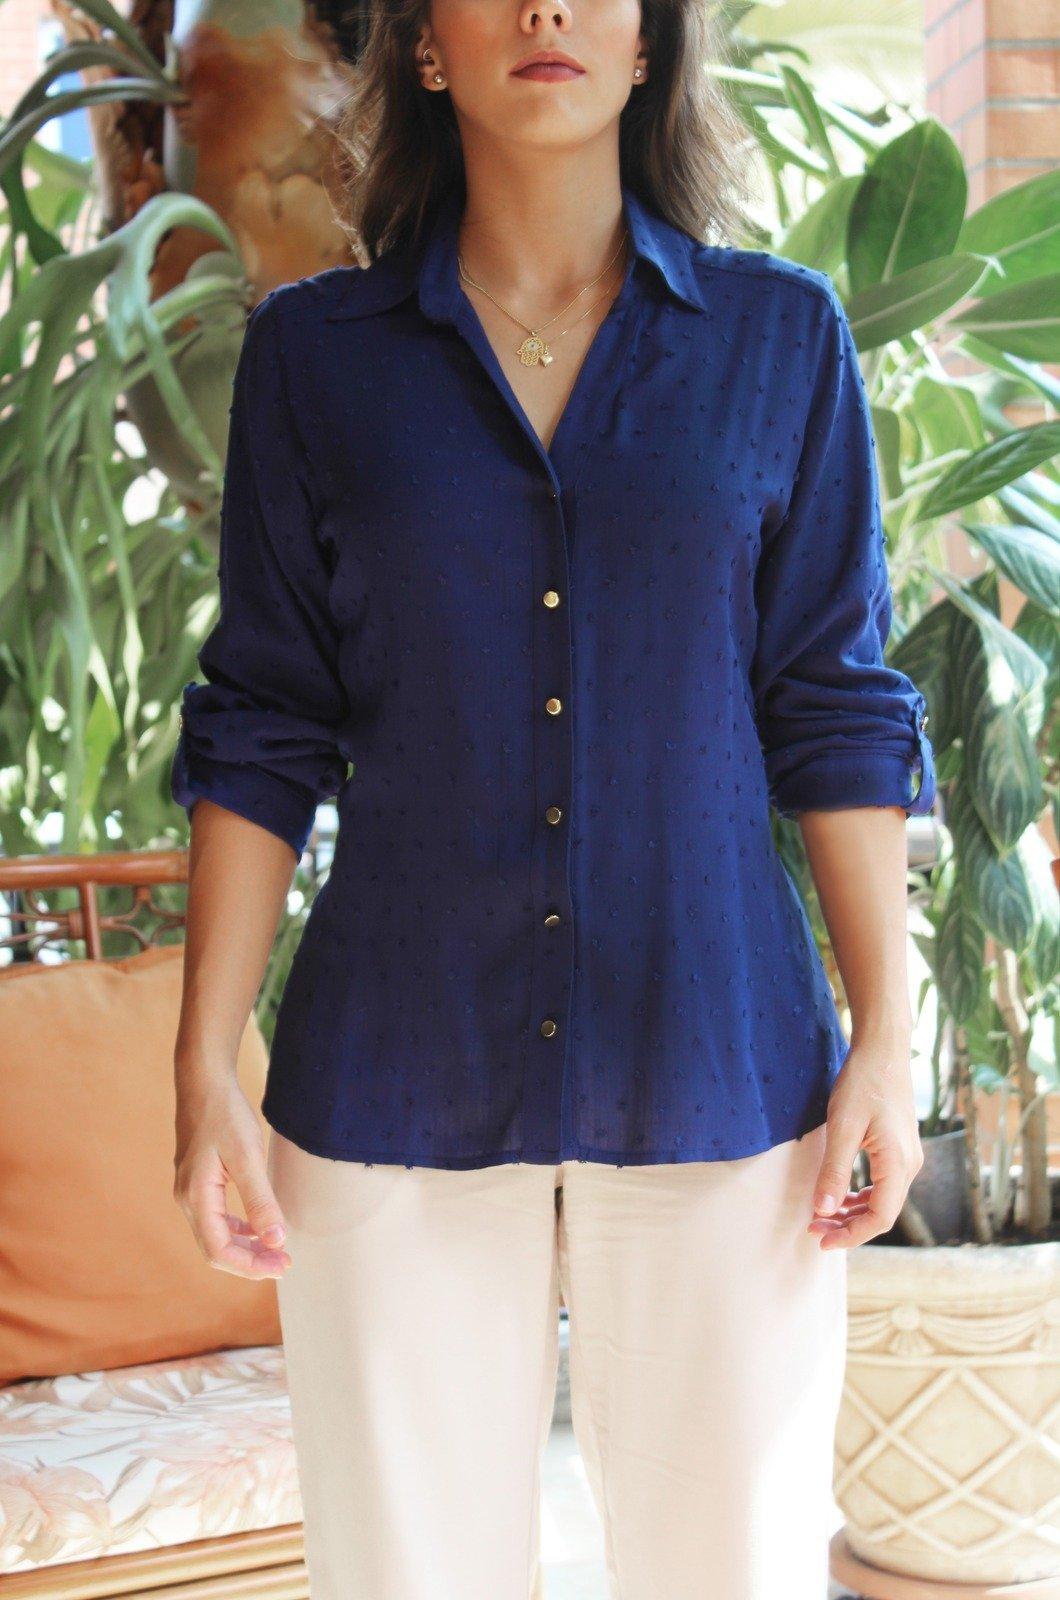 Blusa-camisera-en-rayón-azul-turqui-Chazari-4038-20